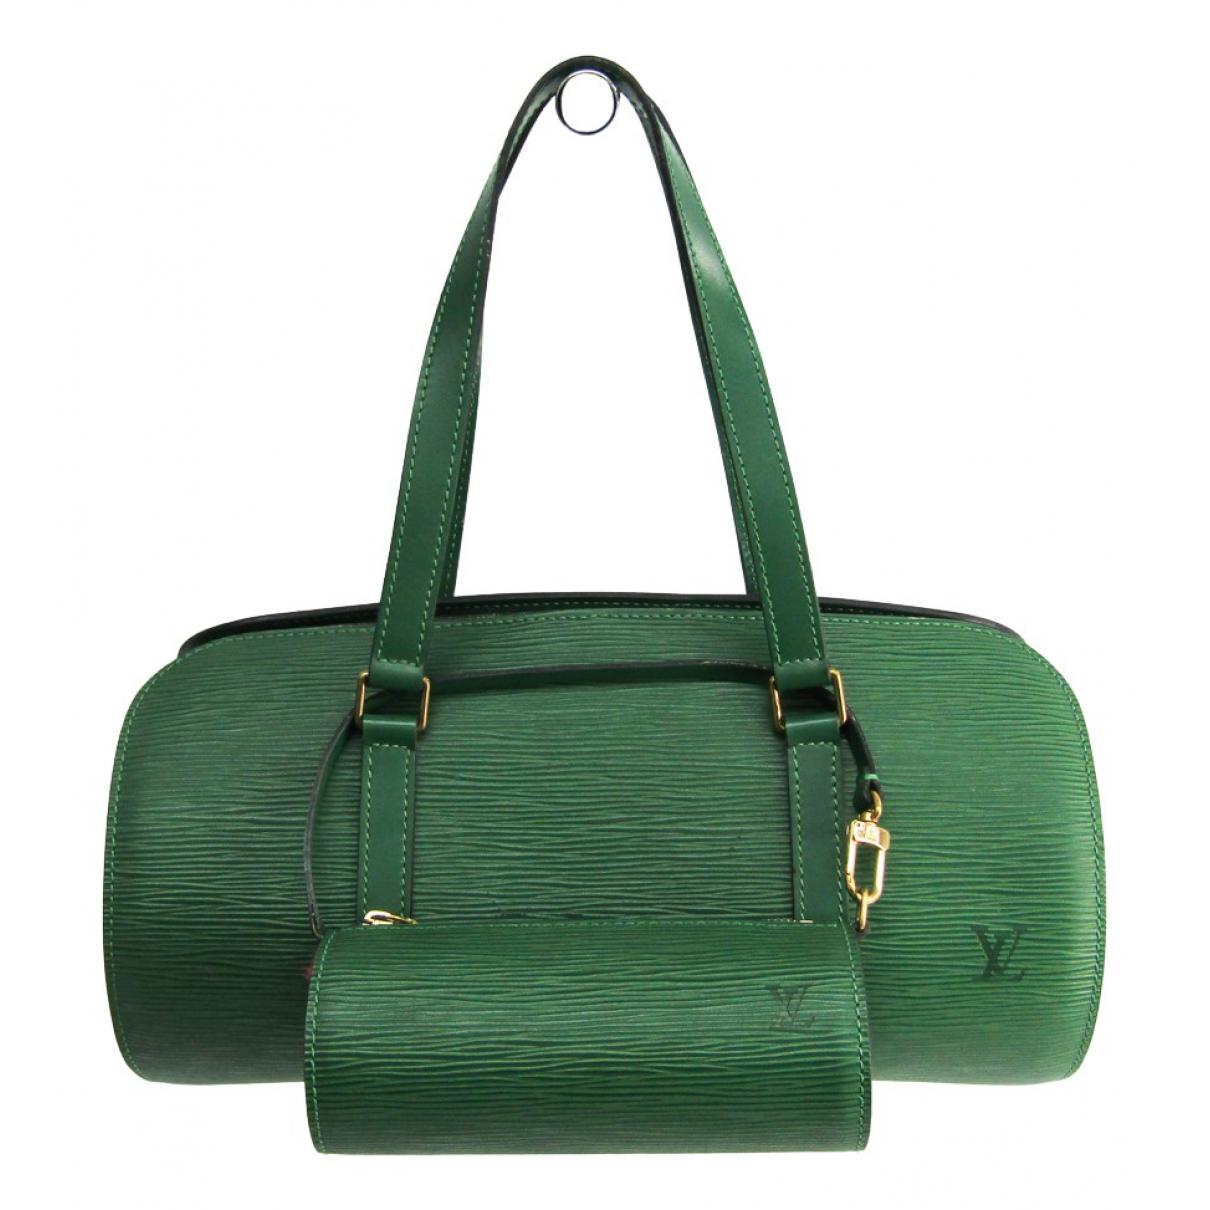 Louis Vuitton Papillon Green Leather handbag for Women N